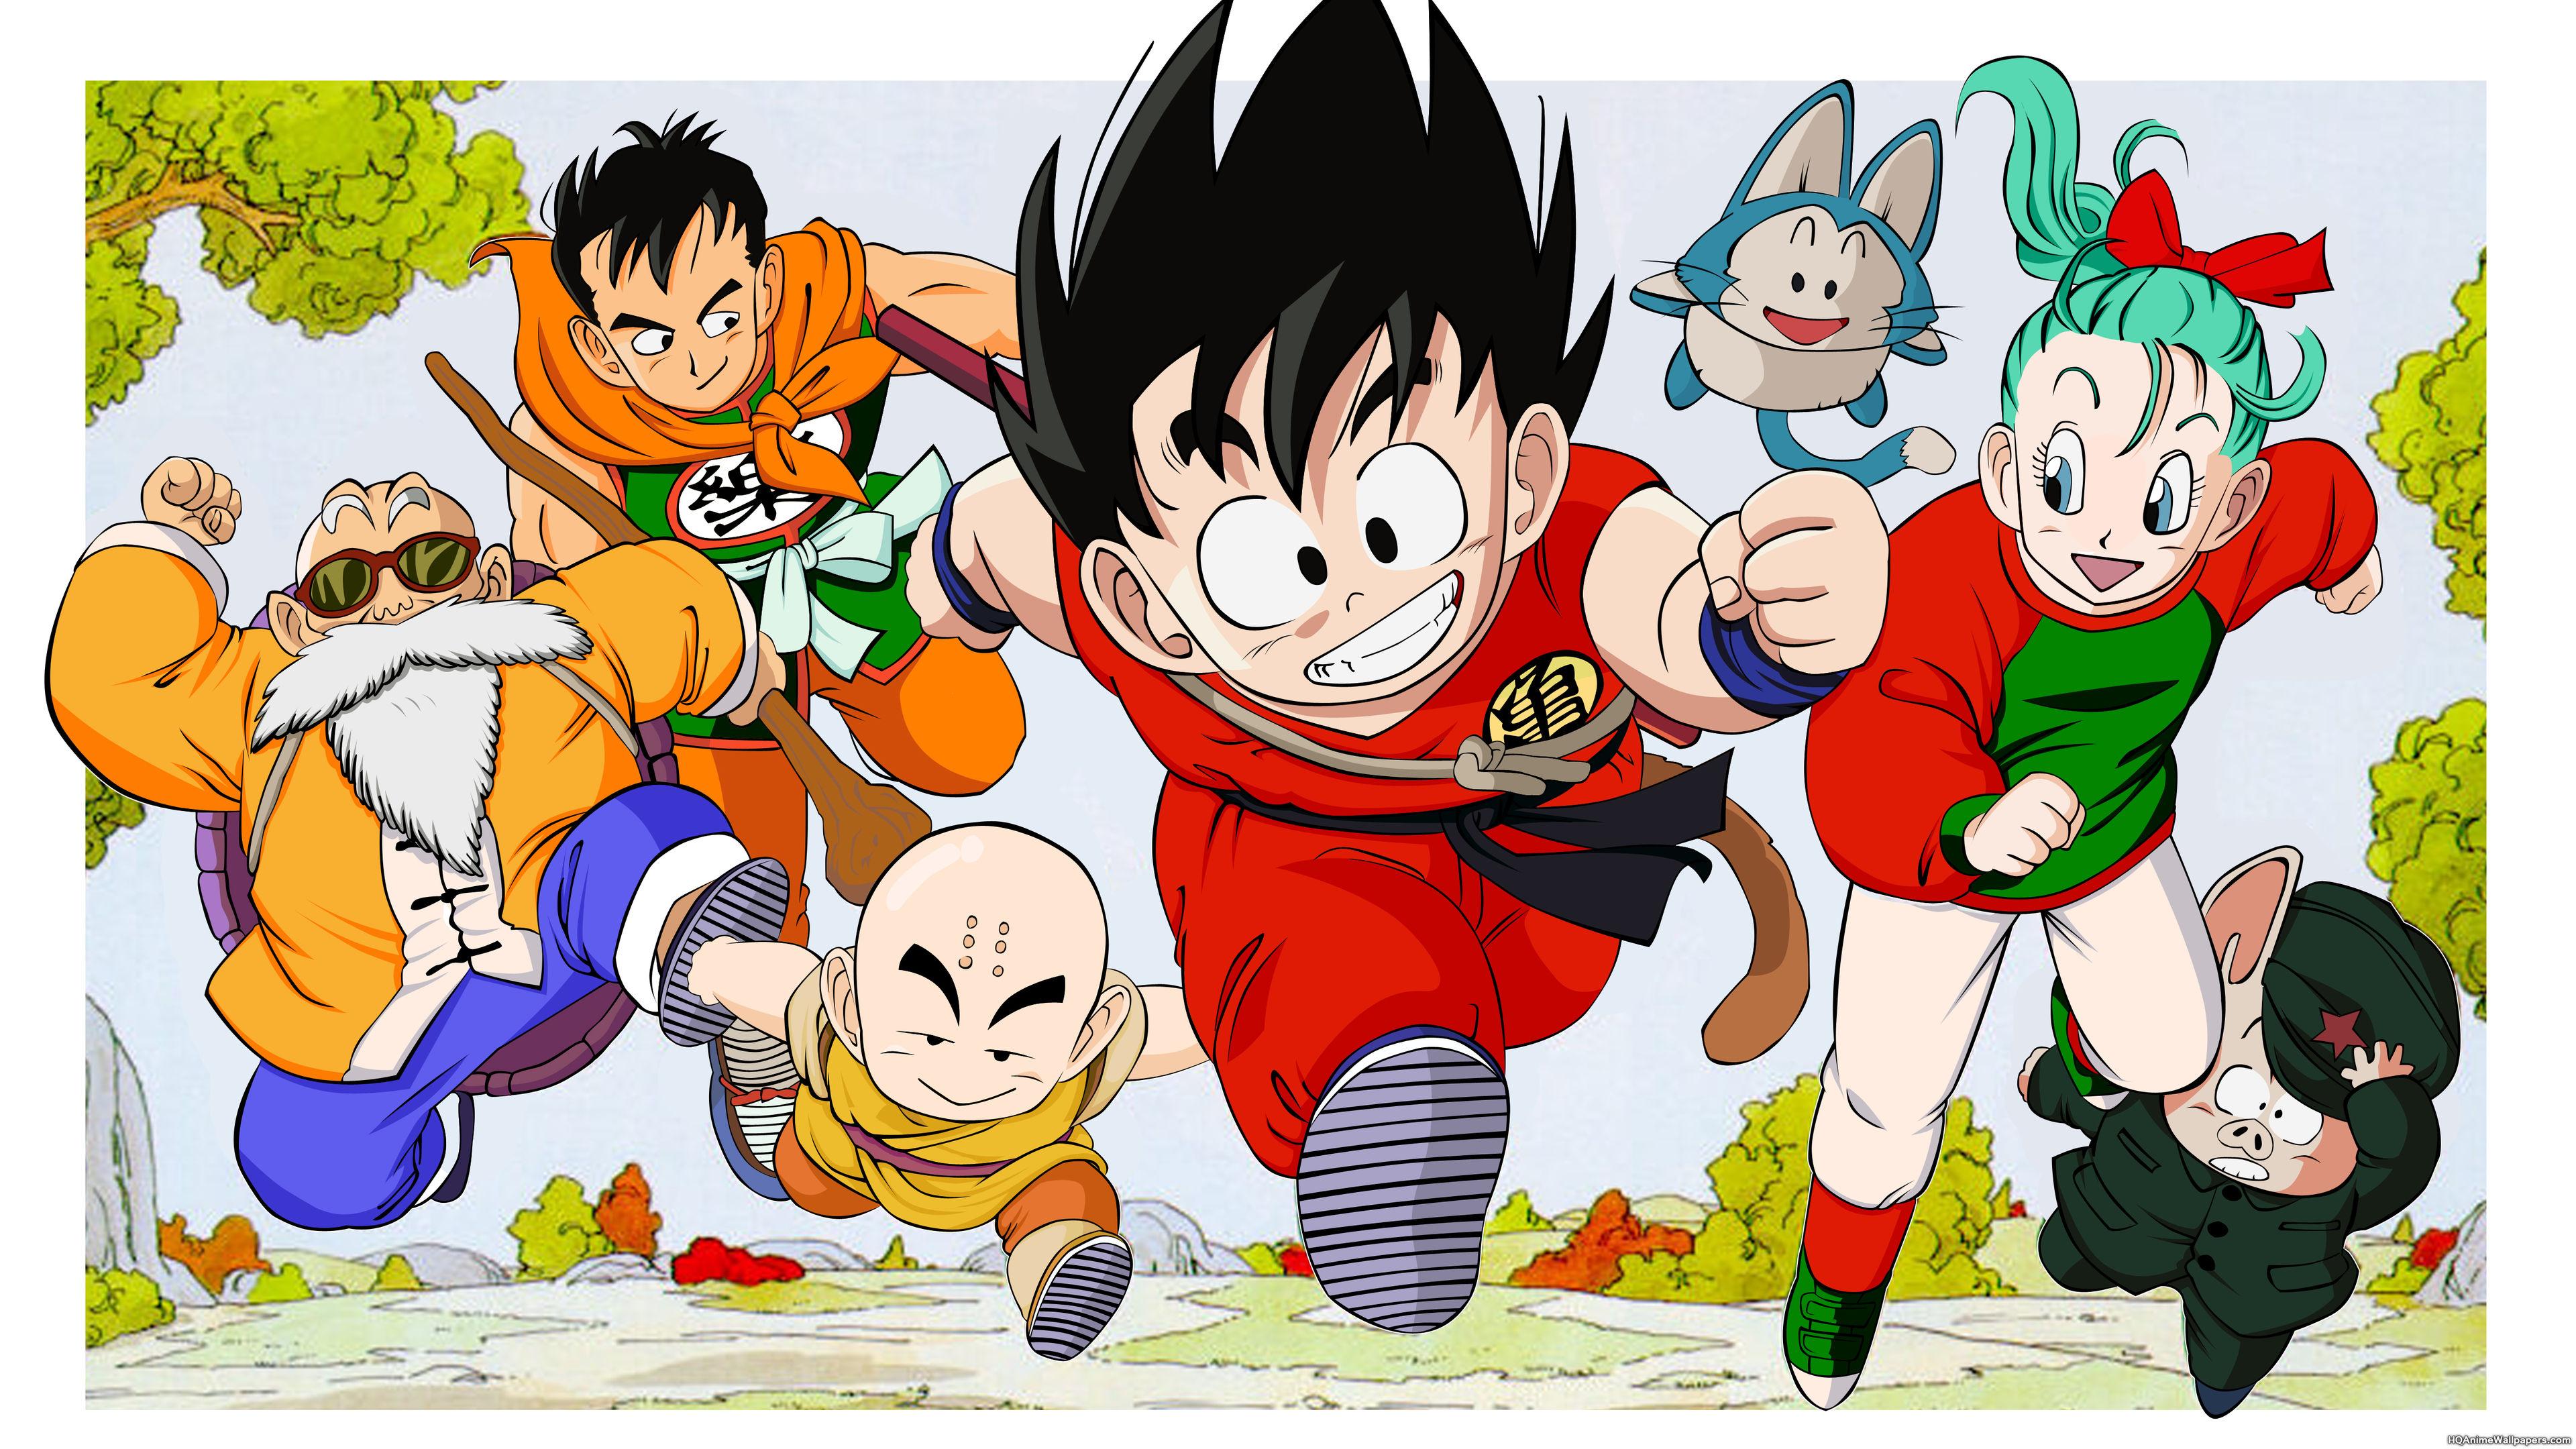 Dragonball super new series set after majin buu saga - Image dragon ball z gratuit ...